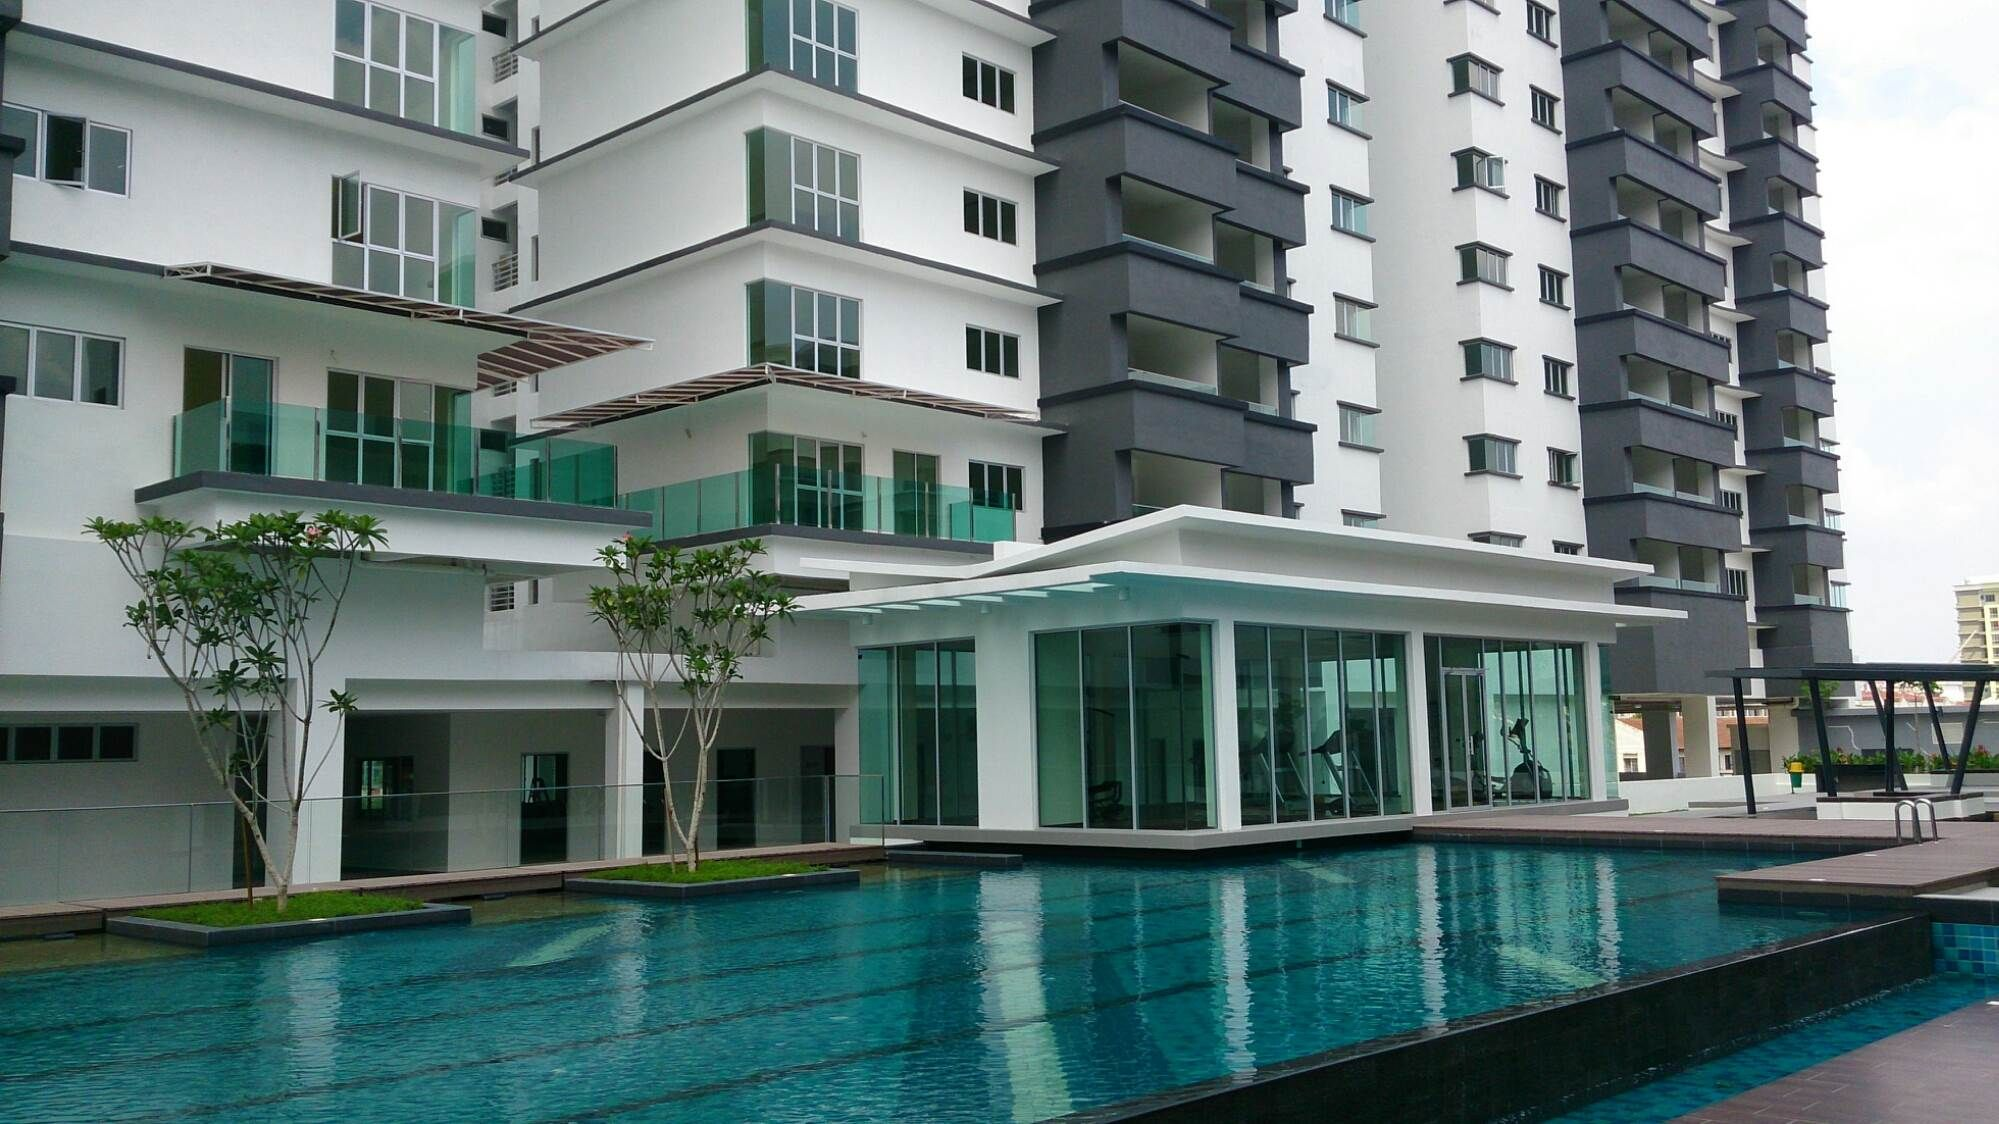 For Rent: Tiara Parkhomes Condo , Selangor Kajang Location: Kajang, Selangor Type: Condo/Serviced Residence Price: RM1200 Size: 1298 sqft  Chan  0143203566